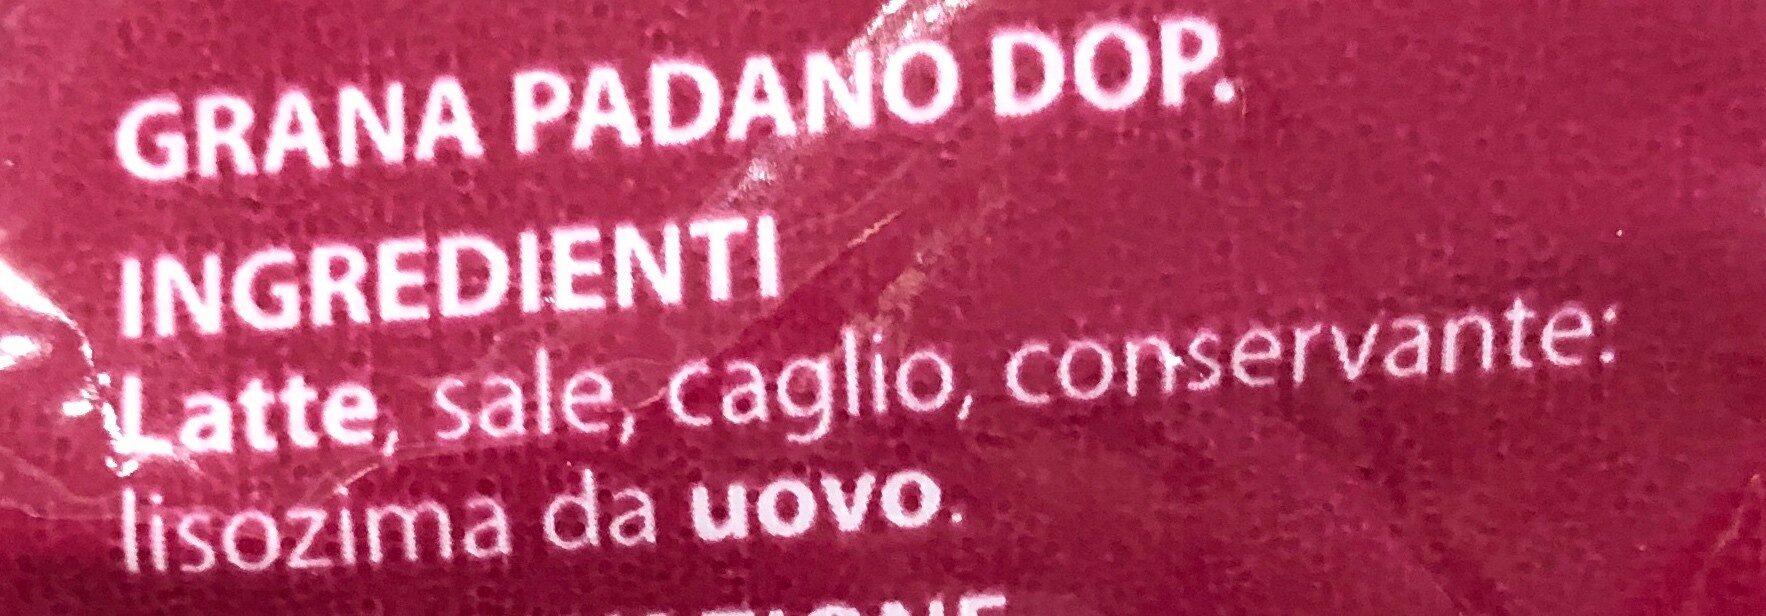 Grana Padano DOP Bocconcini - Ingredients